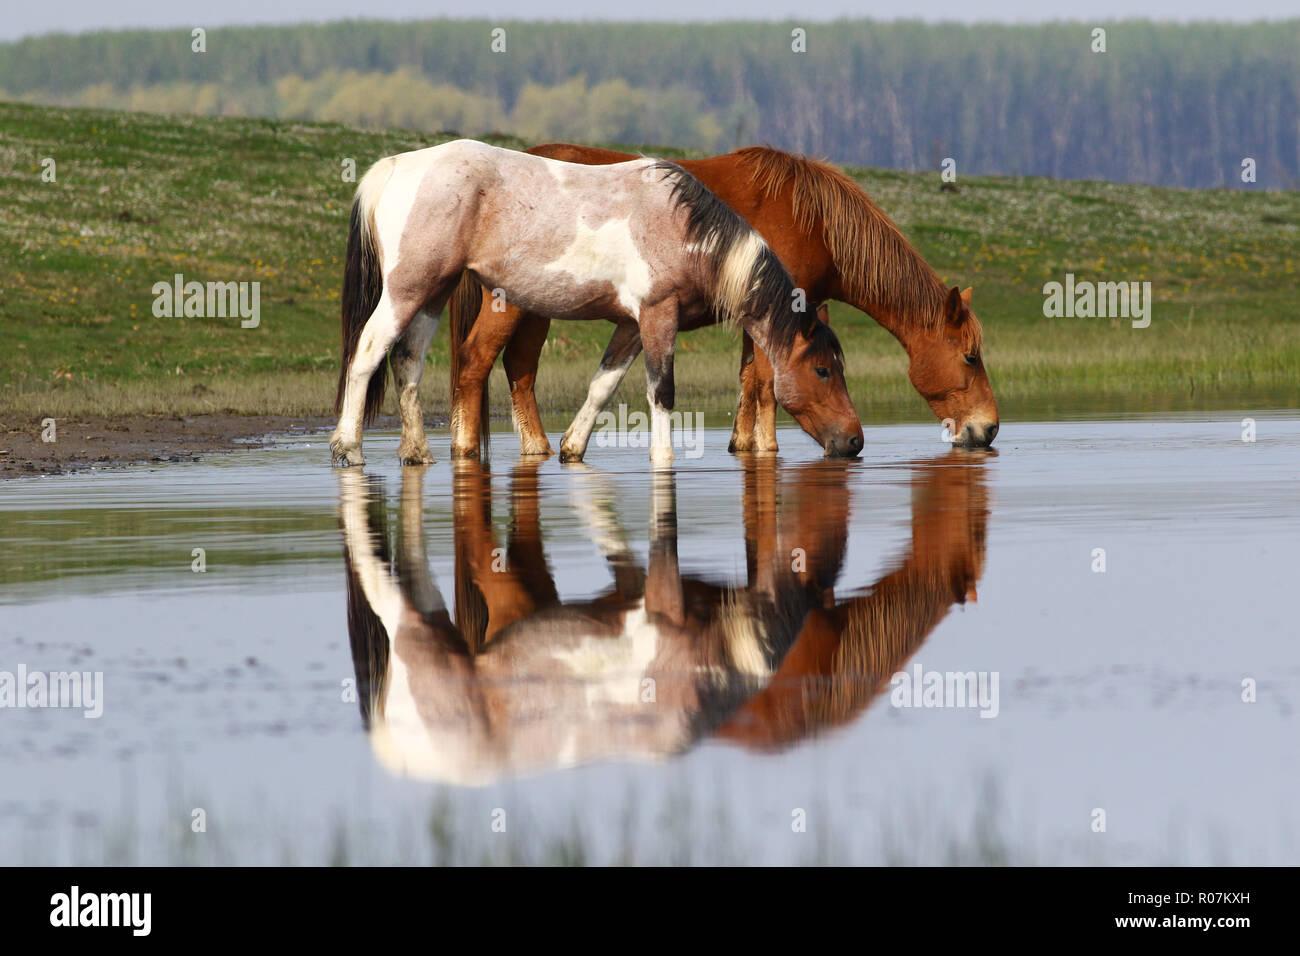 Two Wild Beautiful Horses Drinking Water Stock Photo Alamy